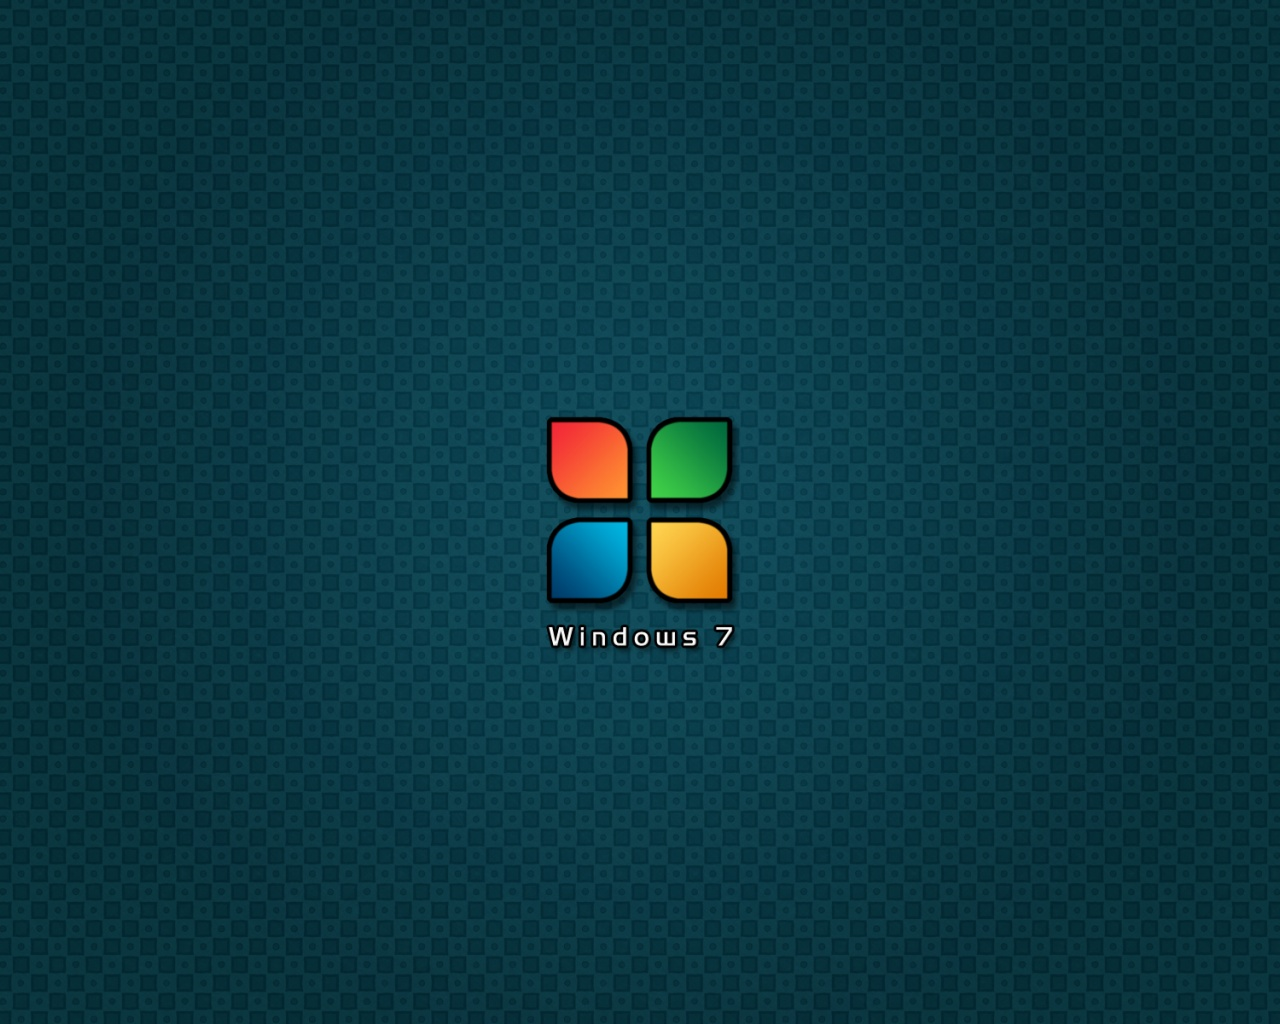 1280x1024 Logo   Windows 7 desktop PC and Mac wallpaper 1280x1024